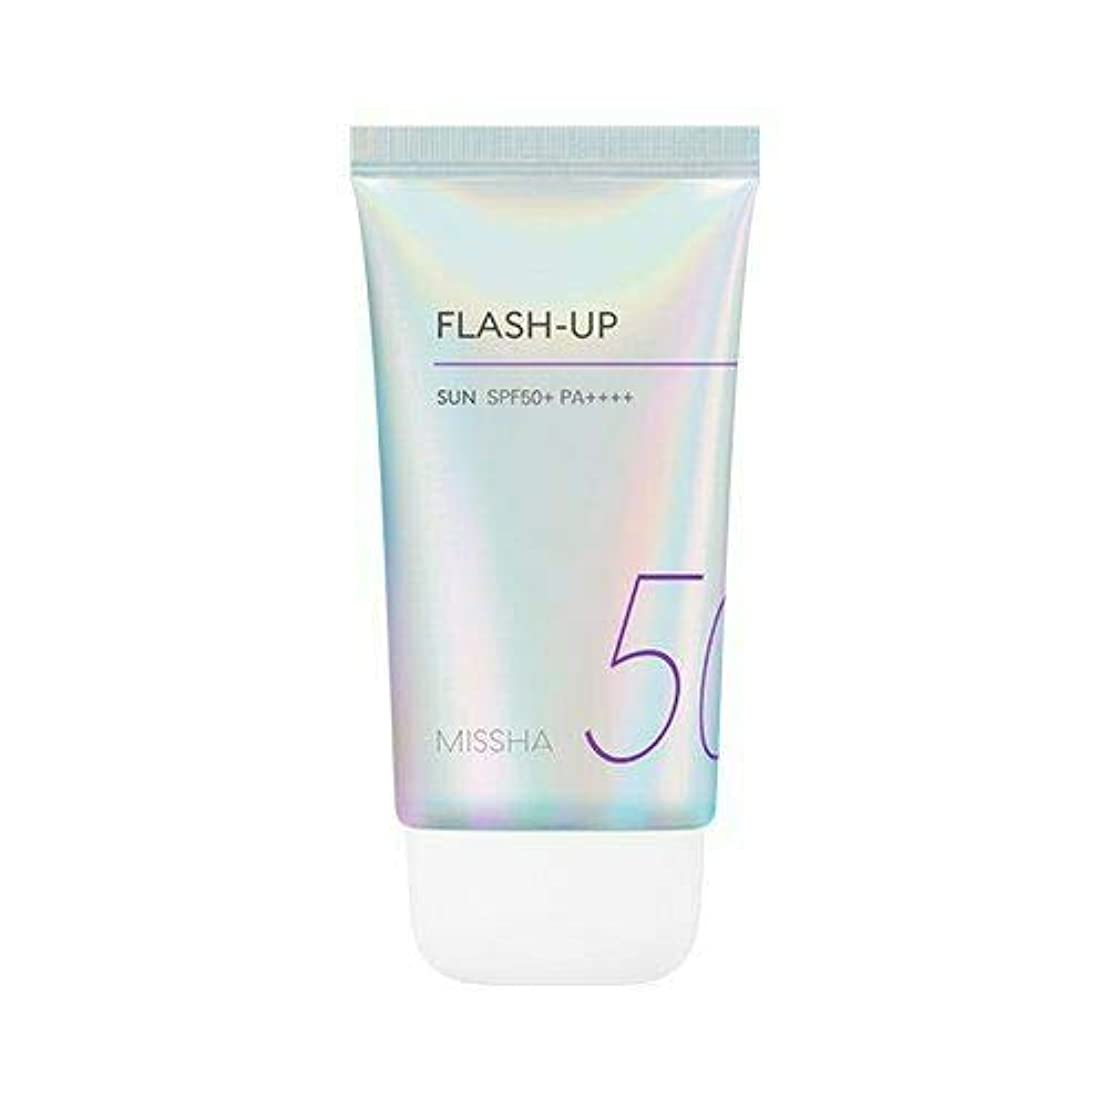 MISSHA ミシャ Flash-Up Sun 50ml SPF50+/PA++++ 韓国日焼け止め